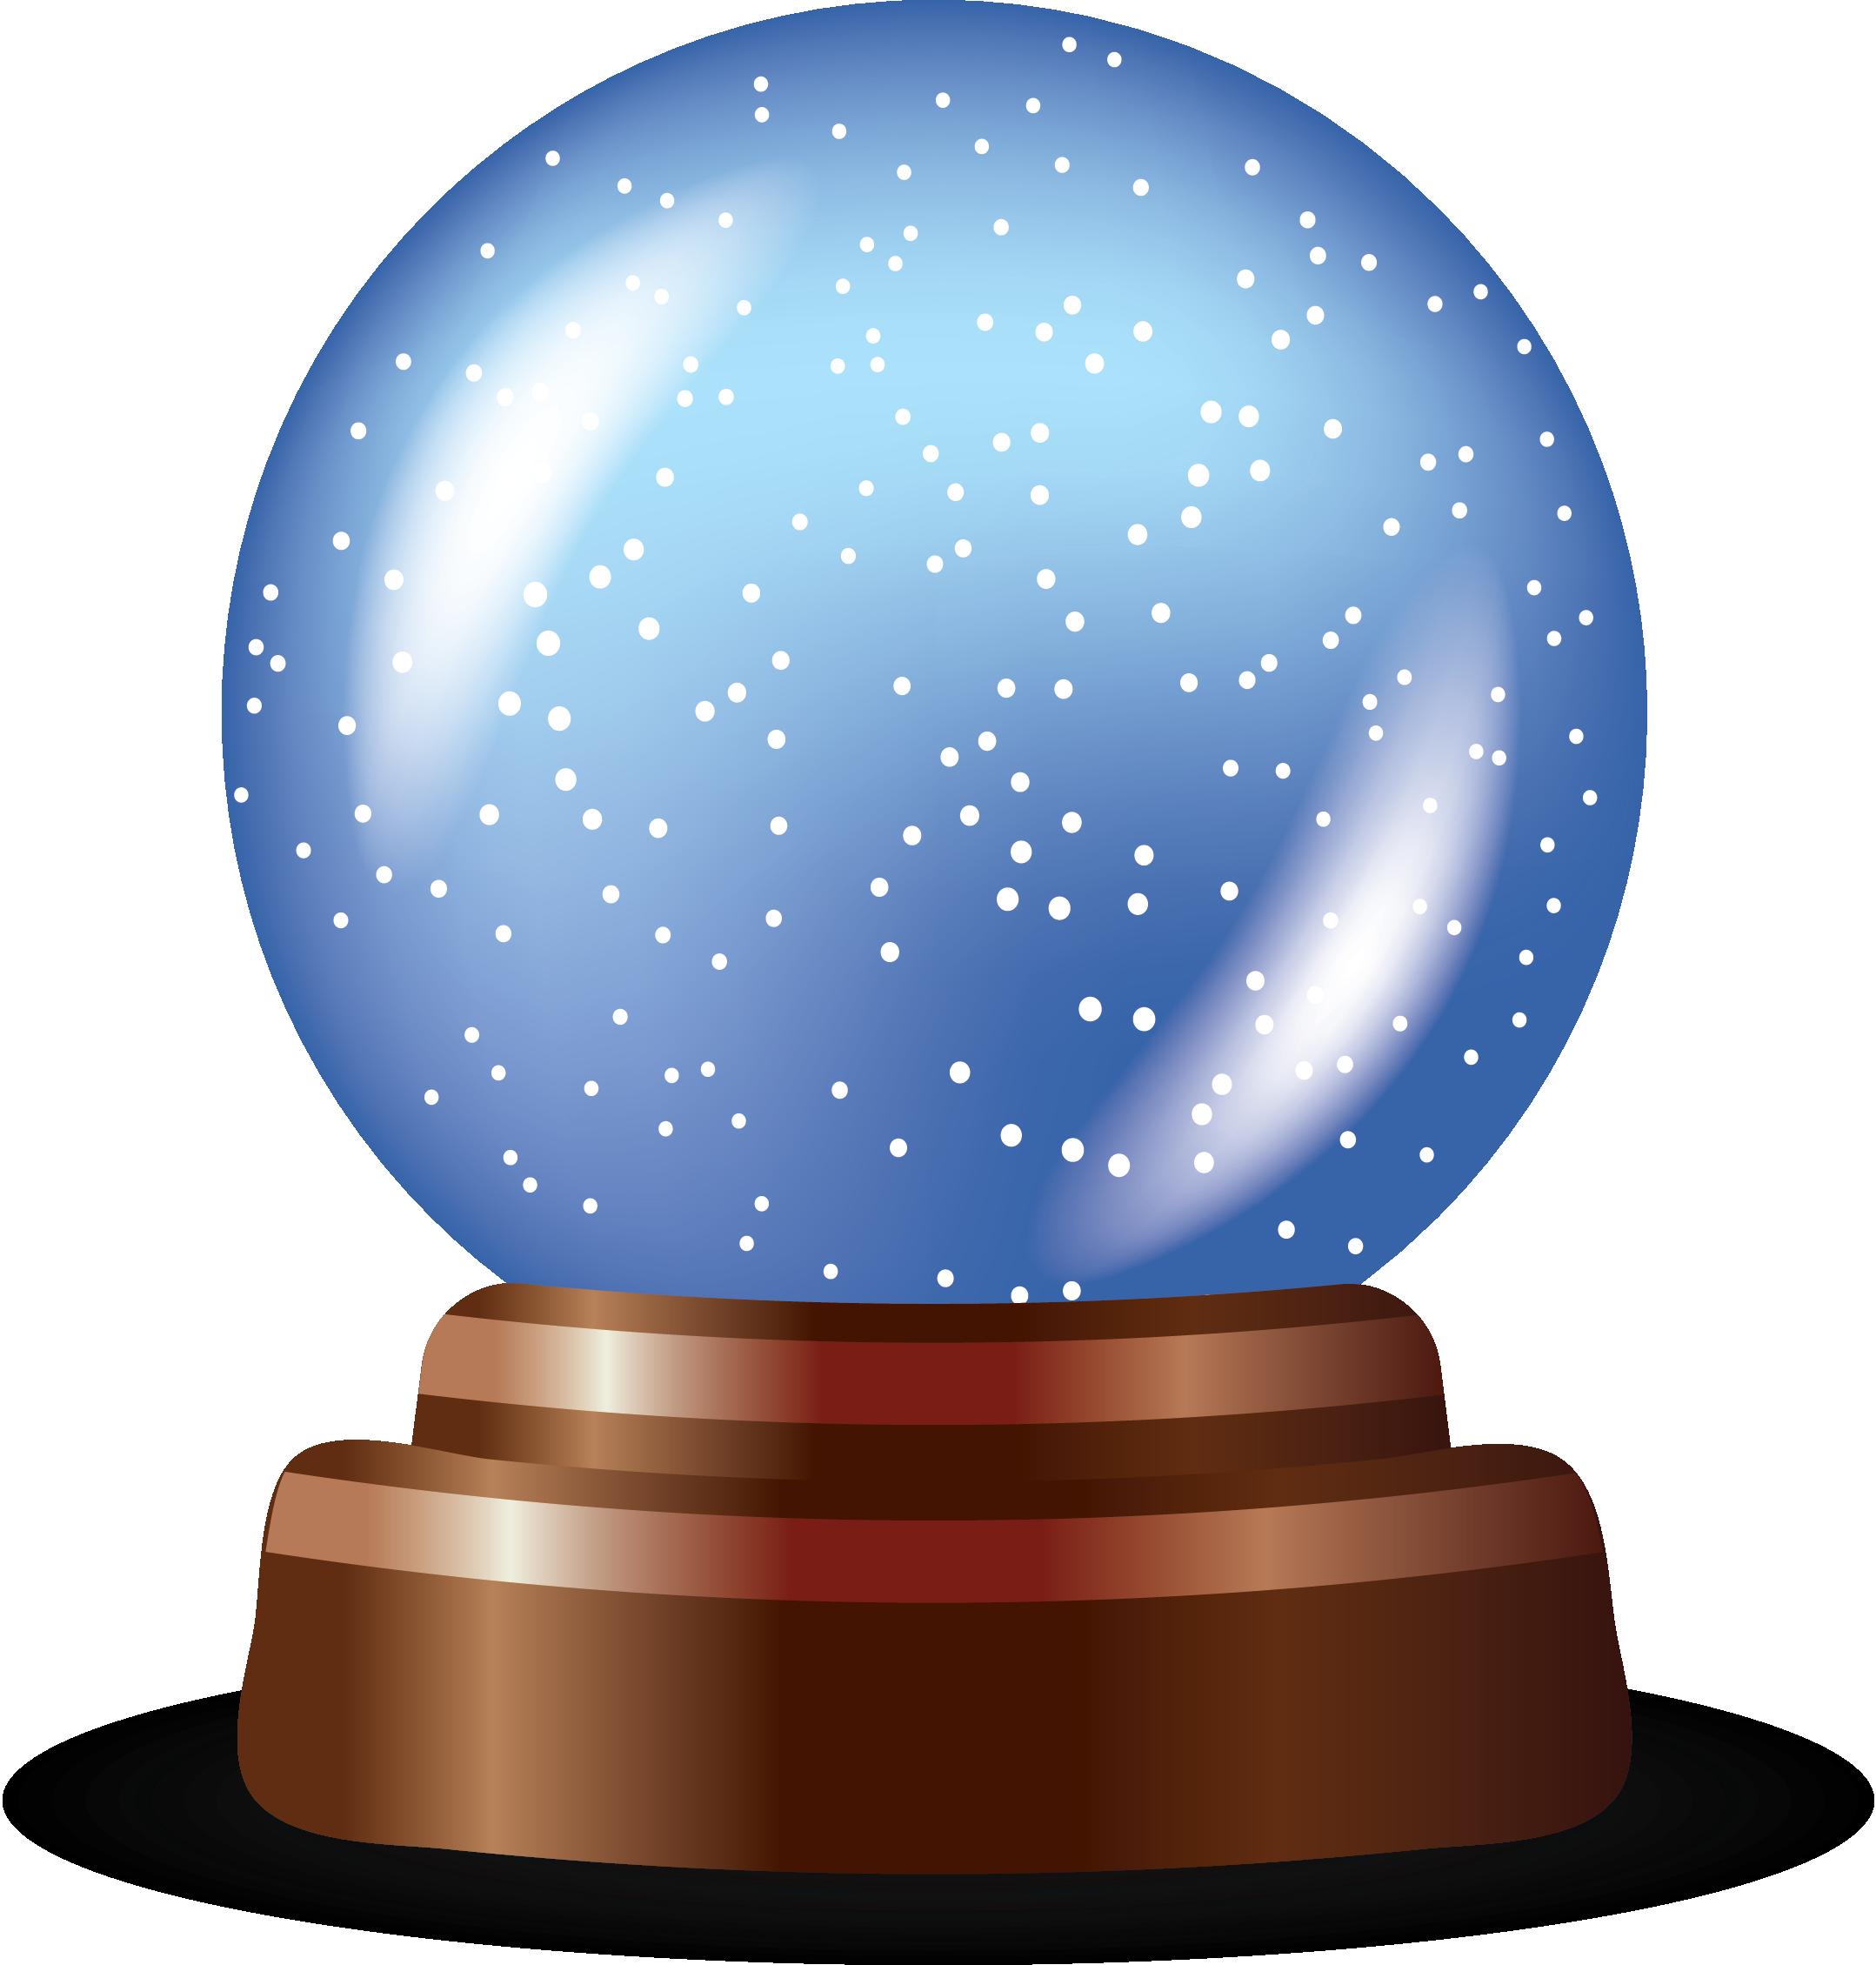 free clipart snow globe - photo #33